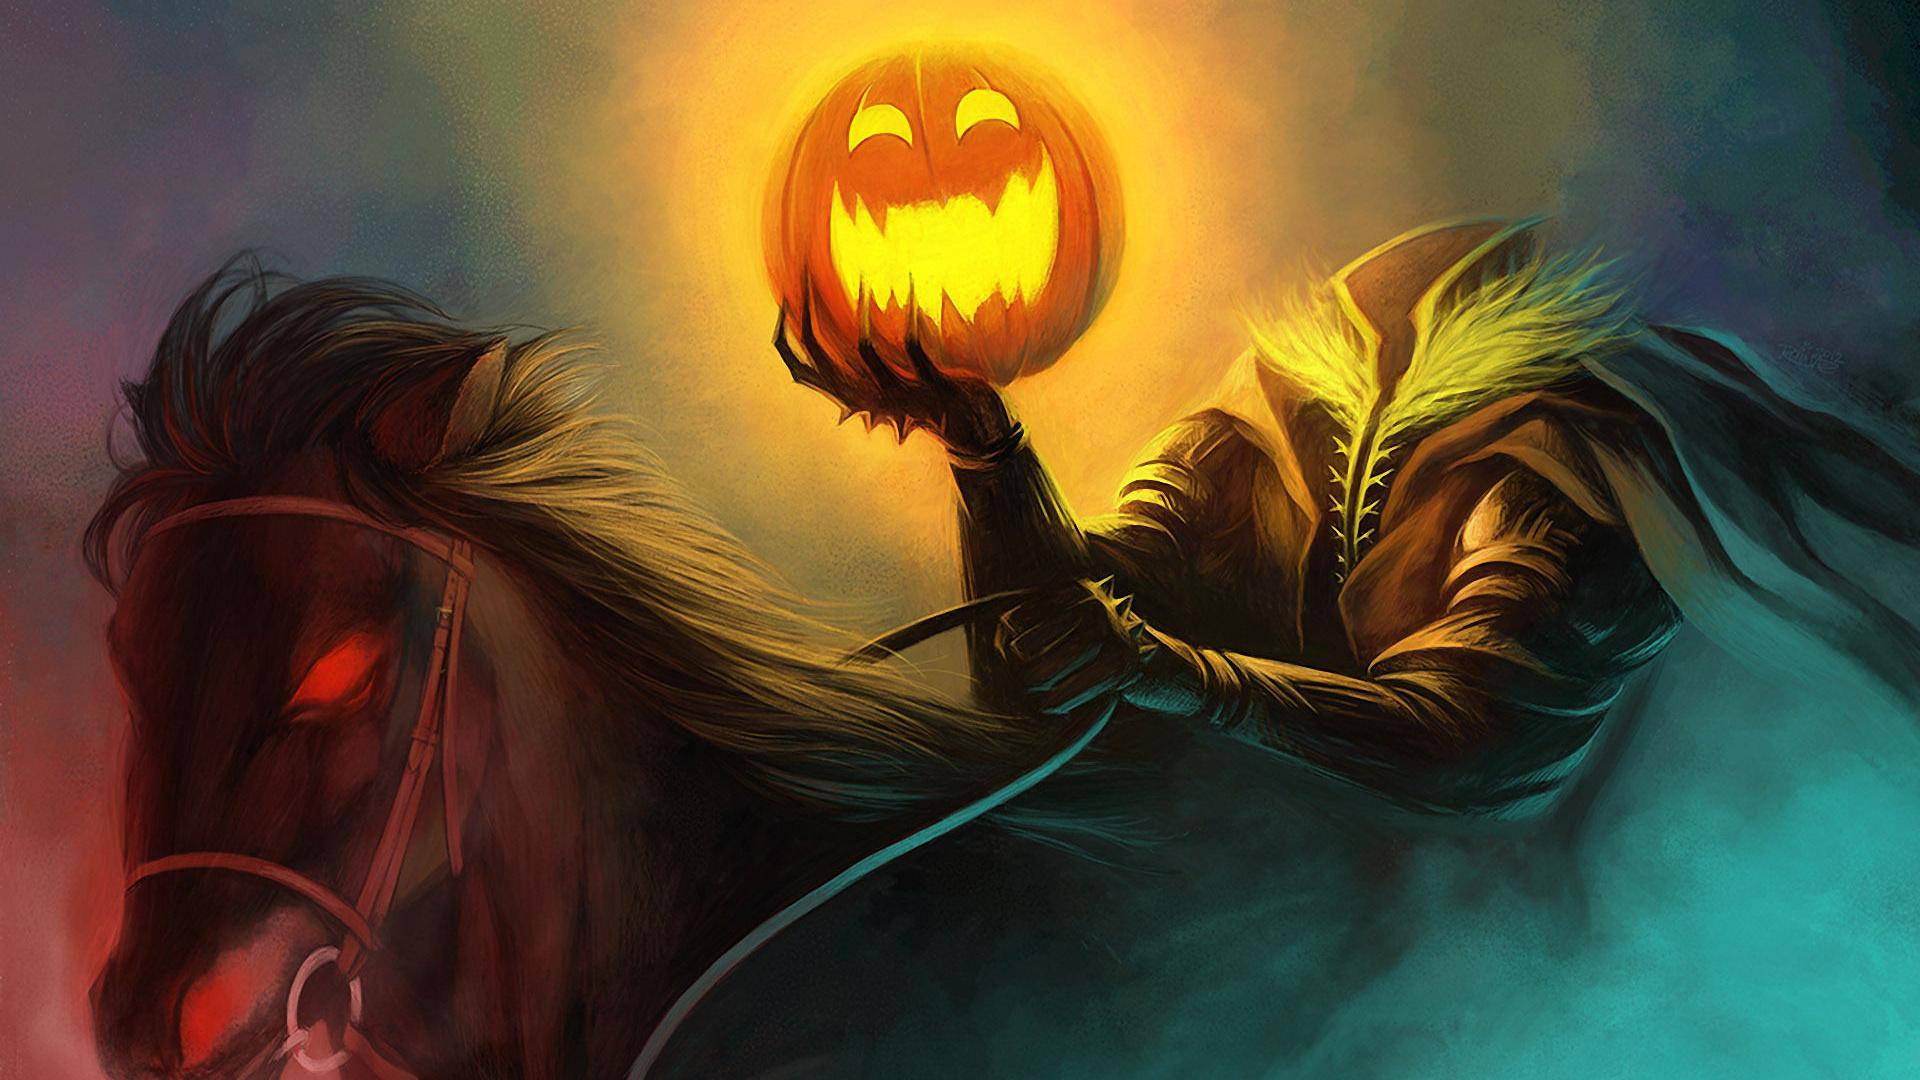 Halloween: Jack-o'-lantern e il cavaliere senza testa